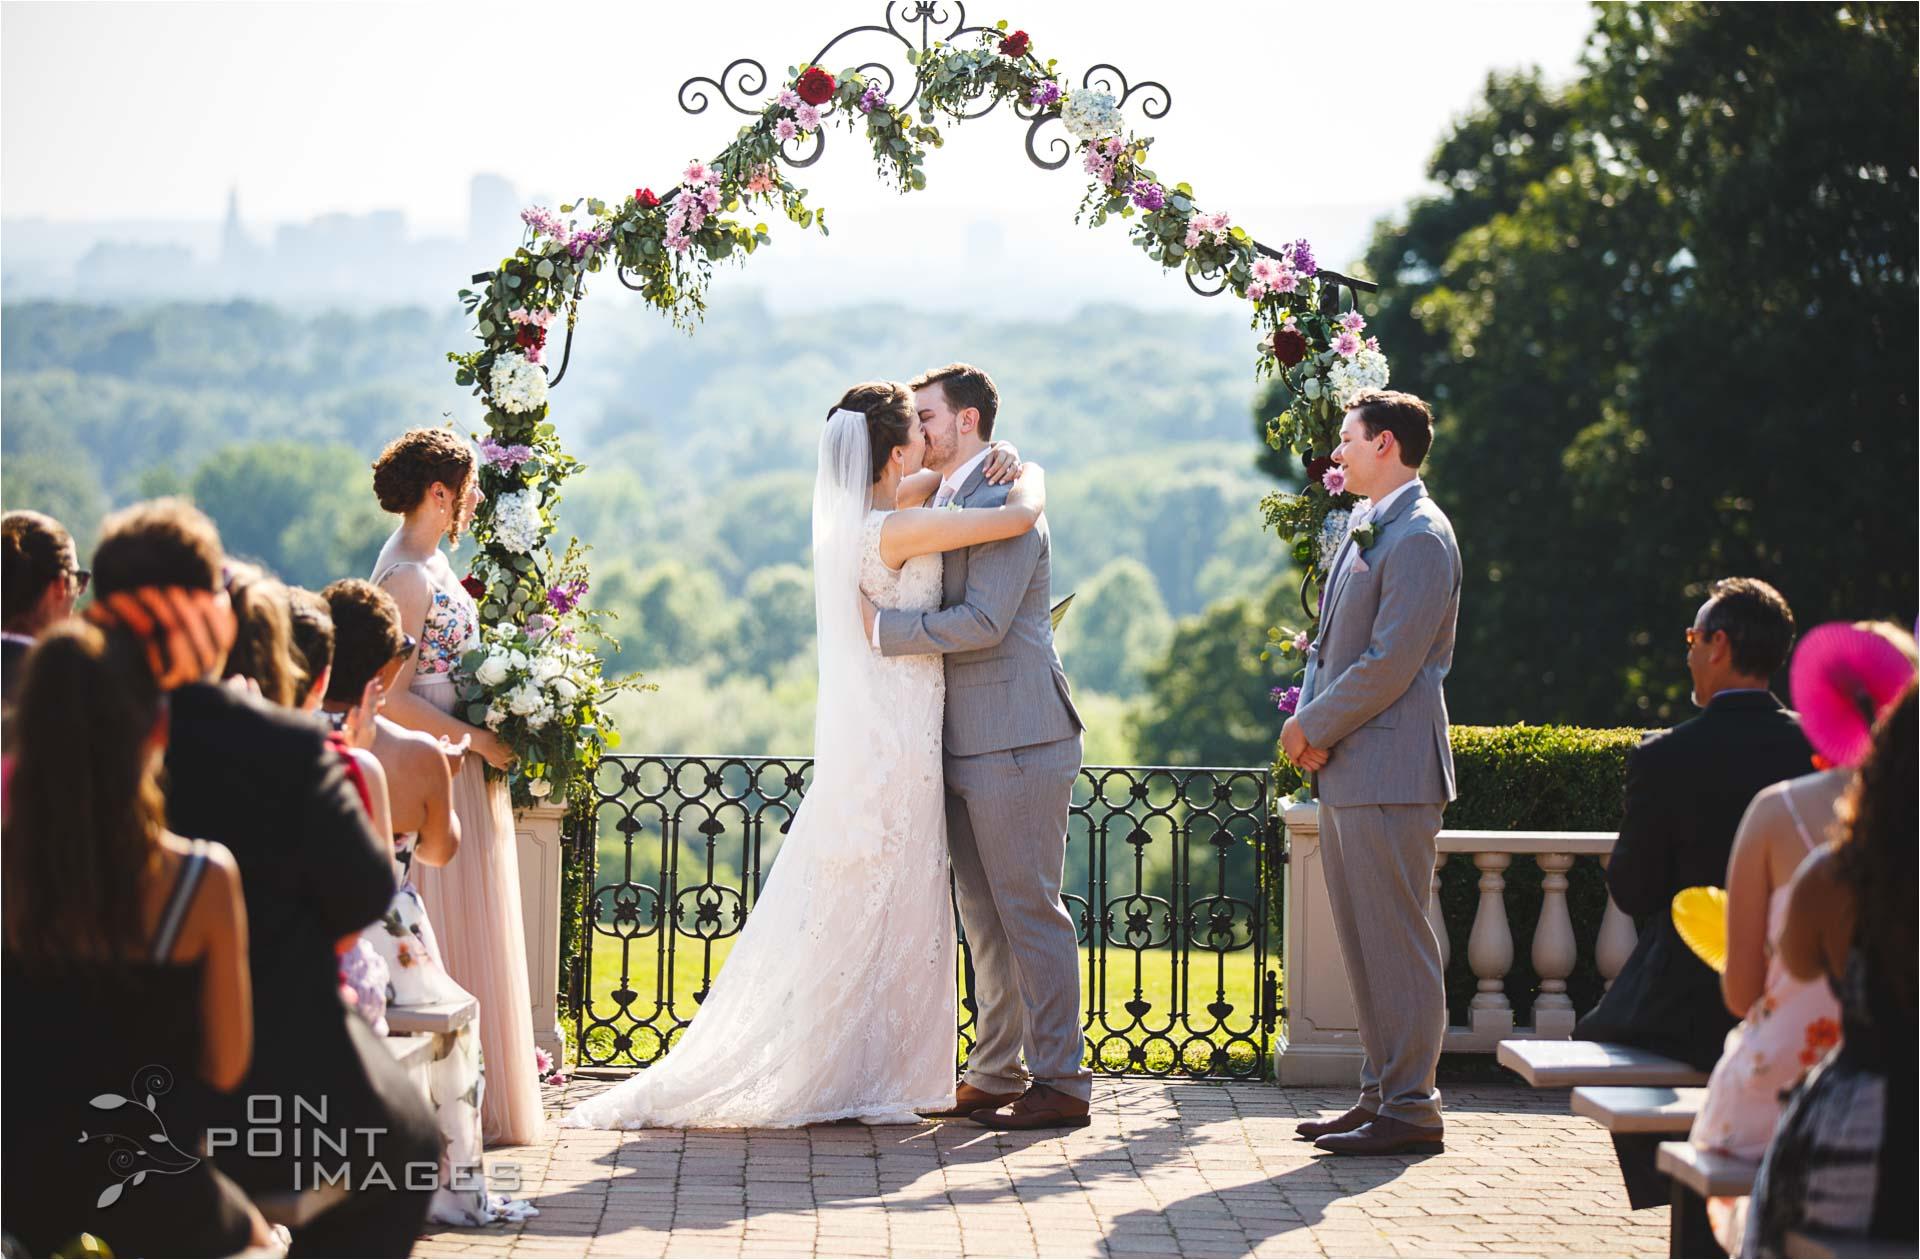 wickham-park-wedding-photographer-ct-24.jpg